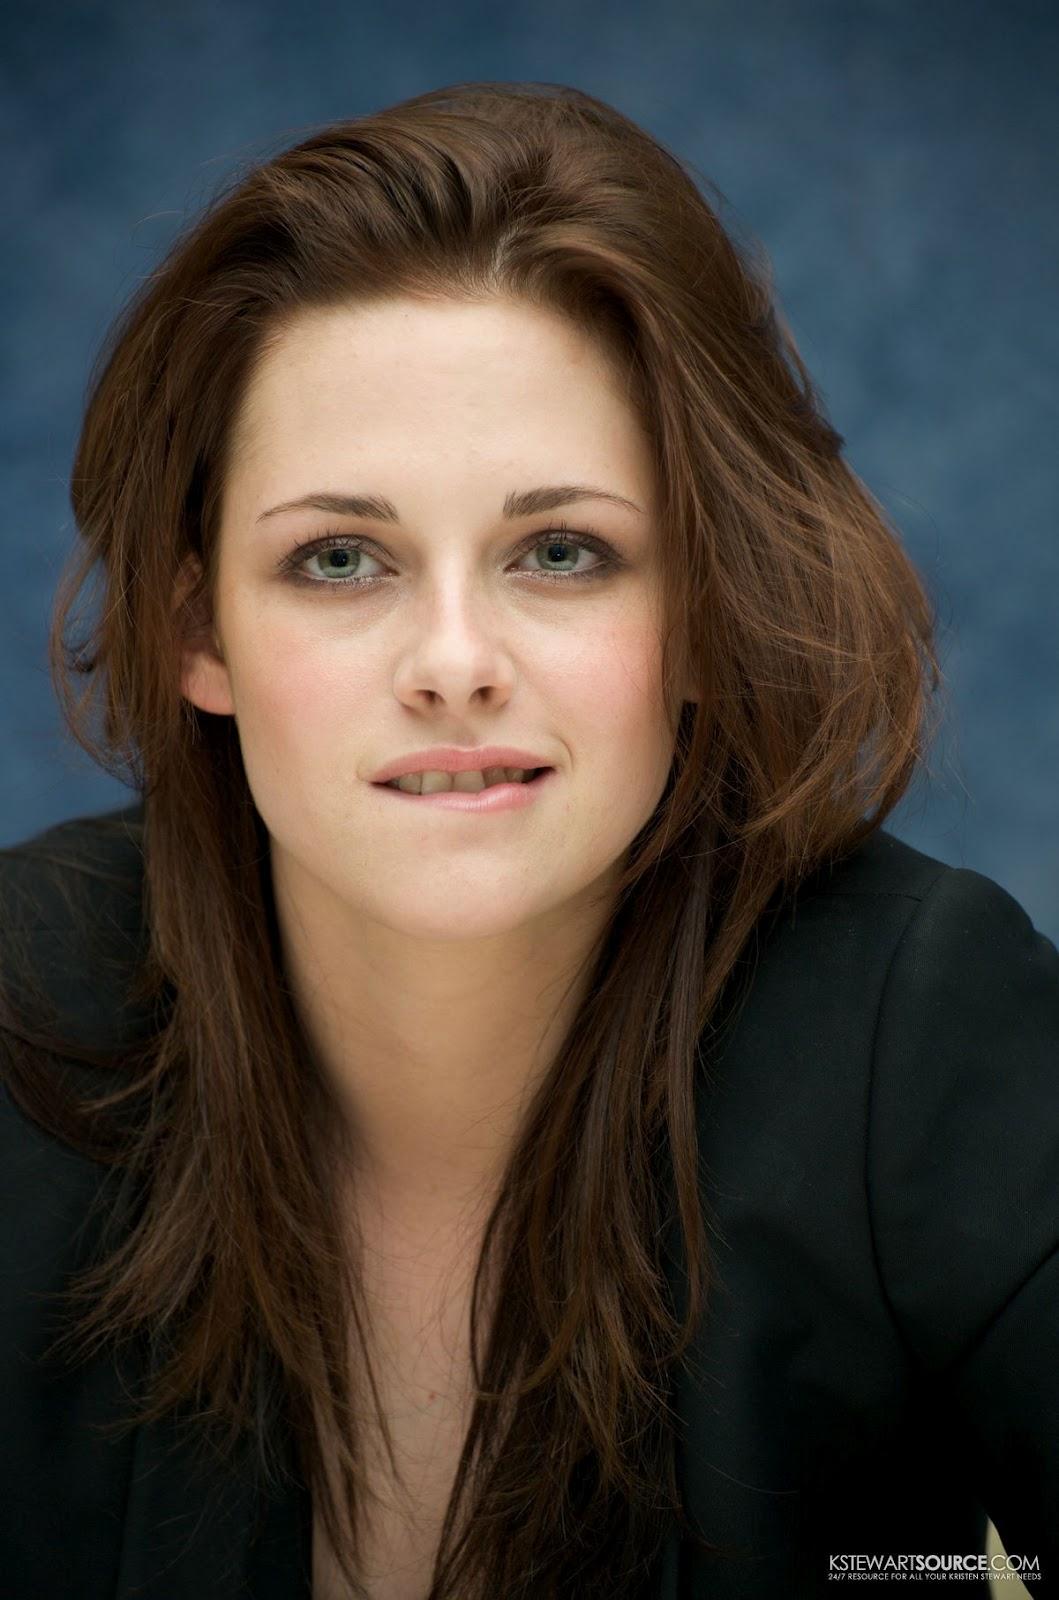 Kristen Lip Kit Matte Liquid Lipstick: You Haven't Seen The Last Of Me: Kristen Stewart